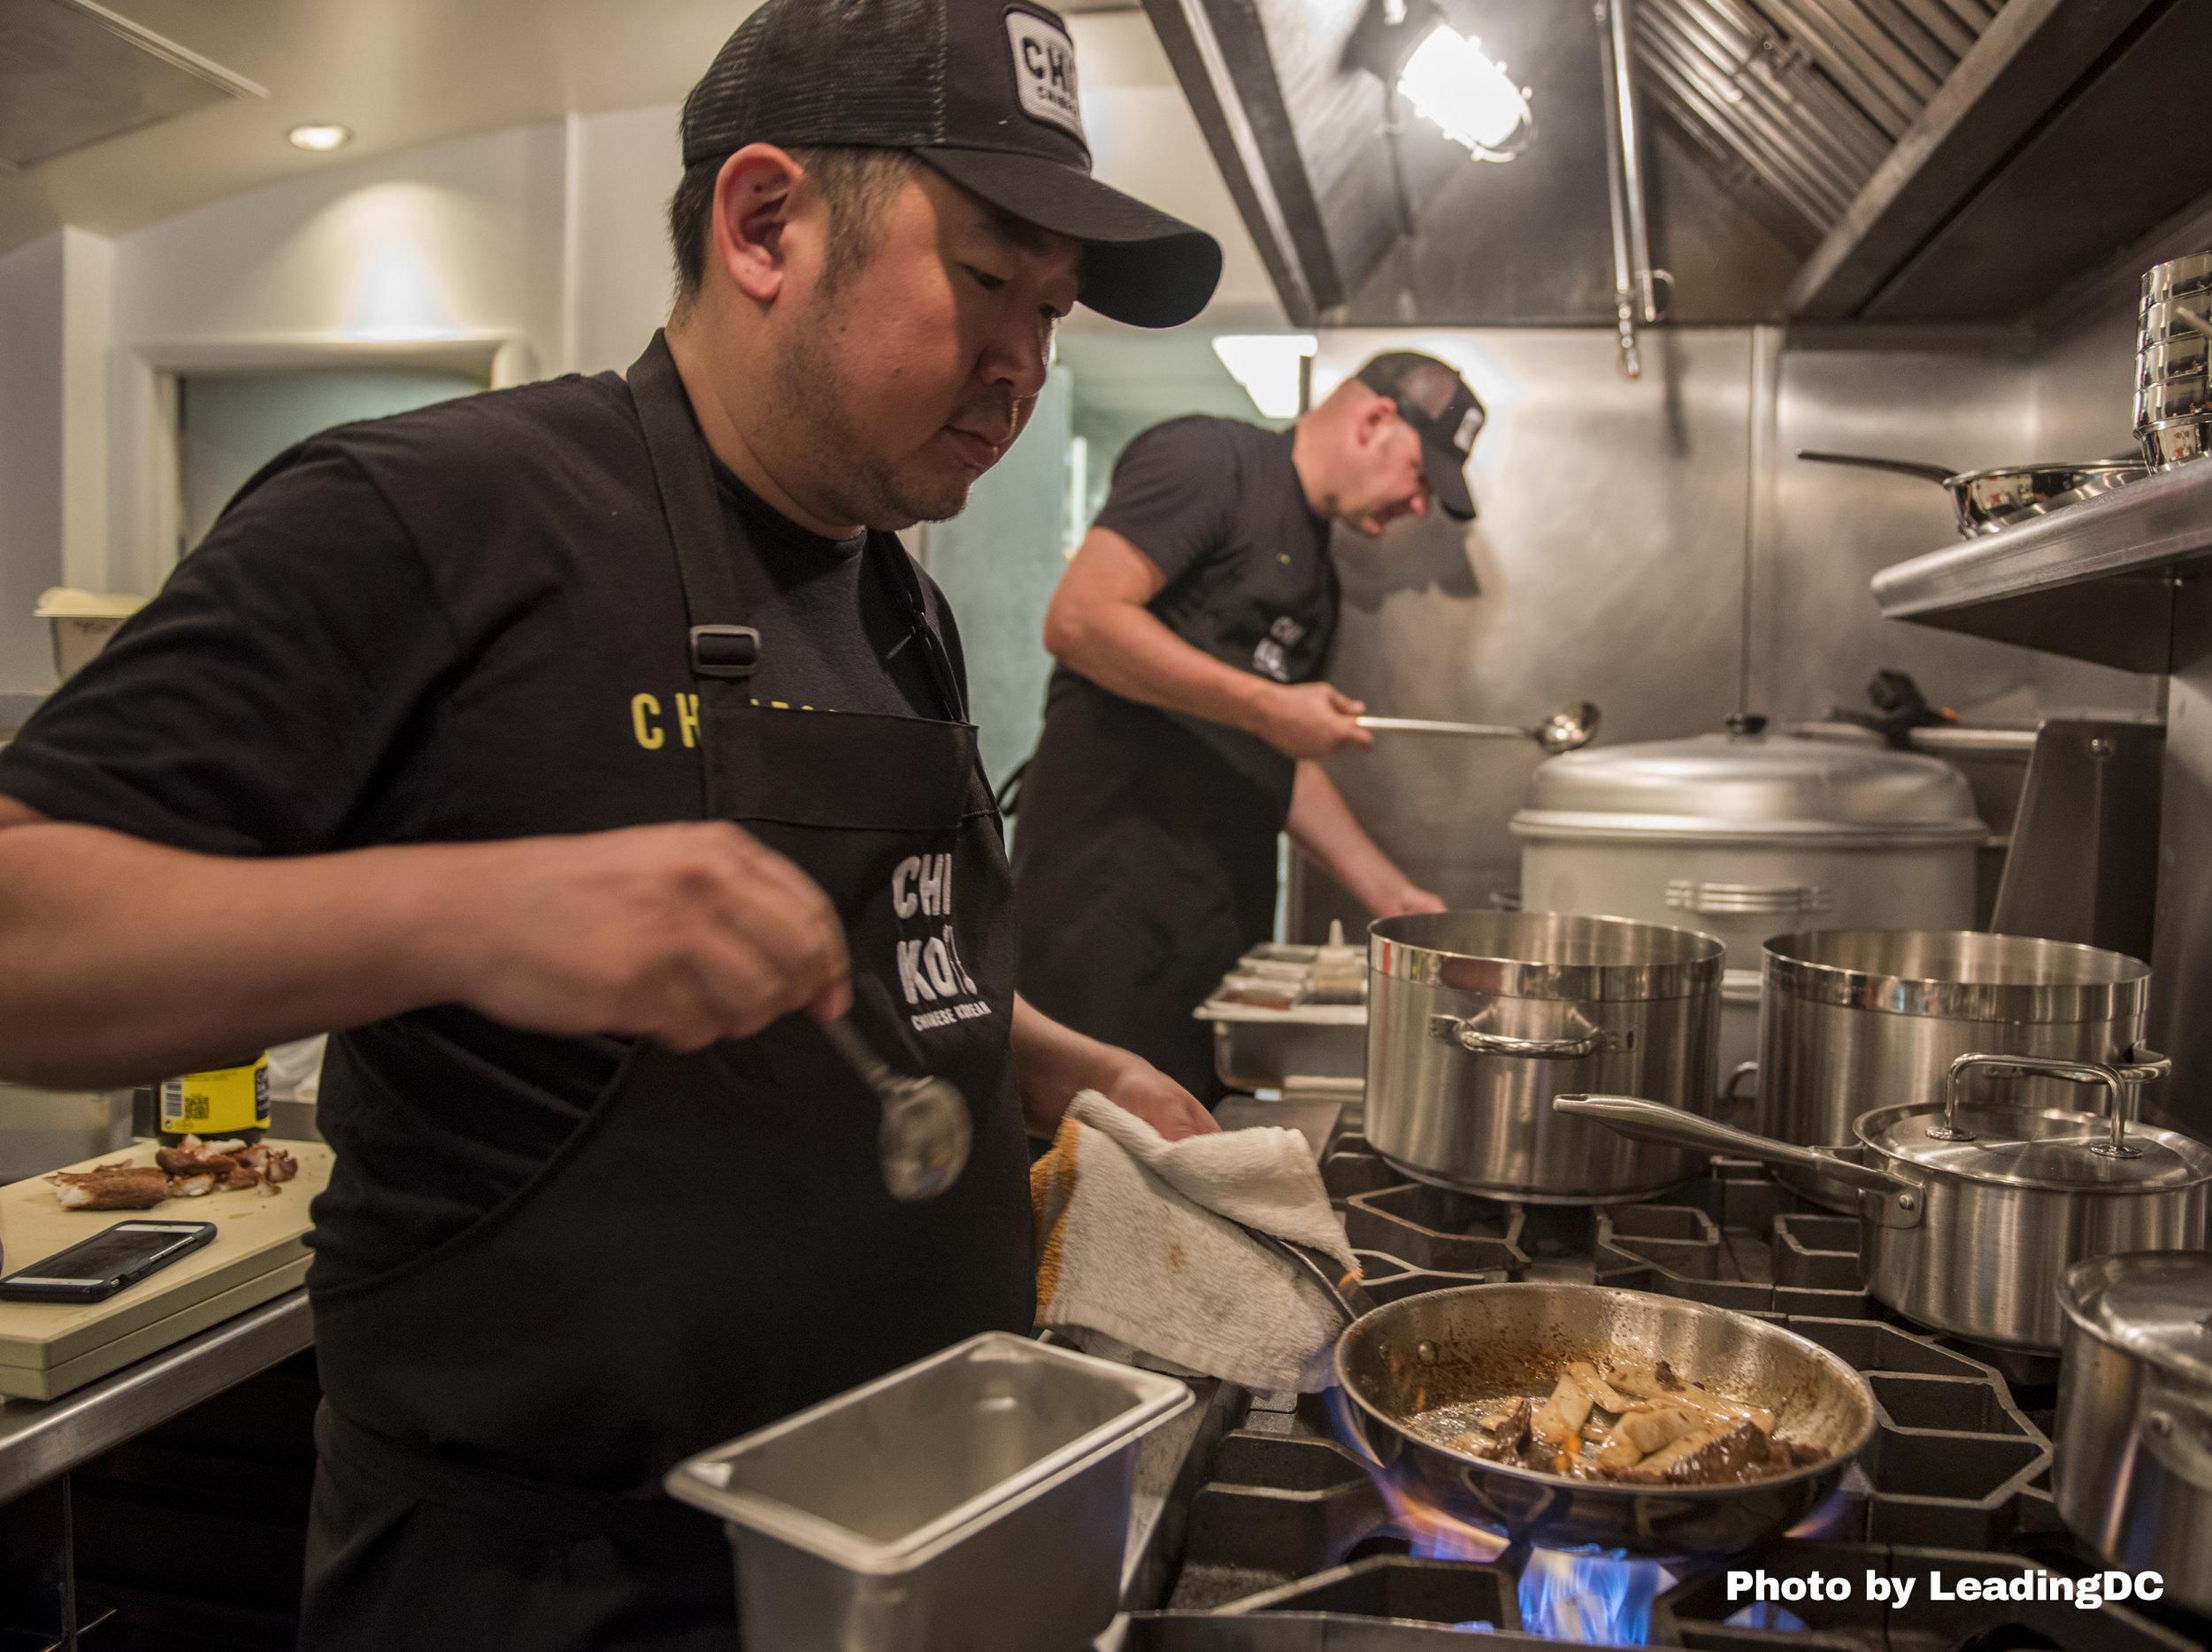 Chefs Danny Lee, left, and Scott Drewno in the kitchen